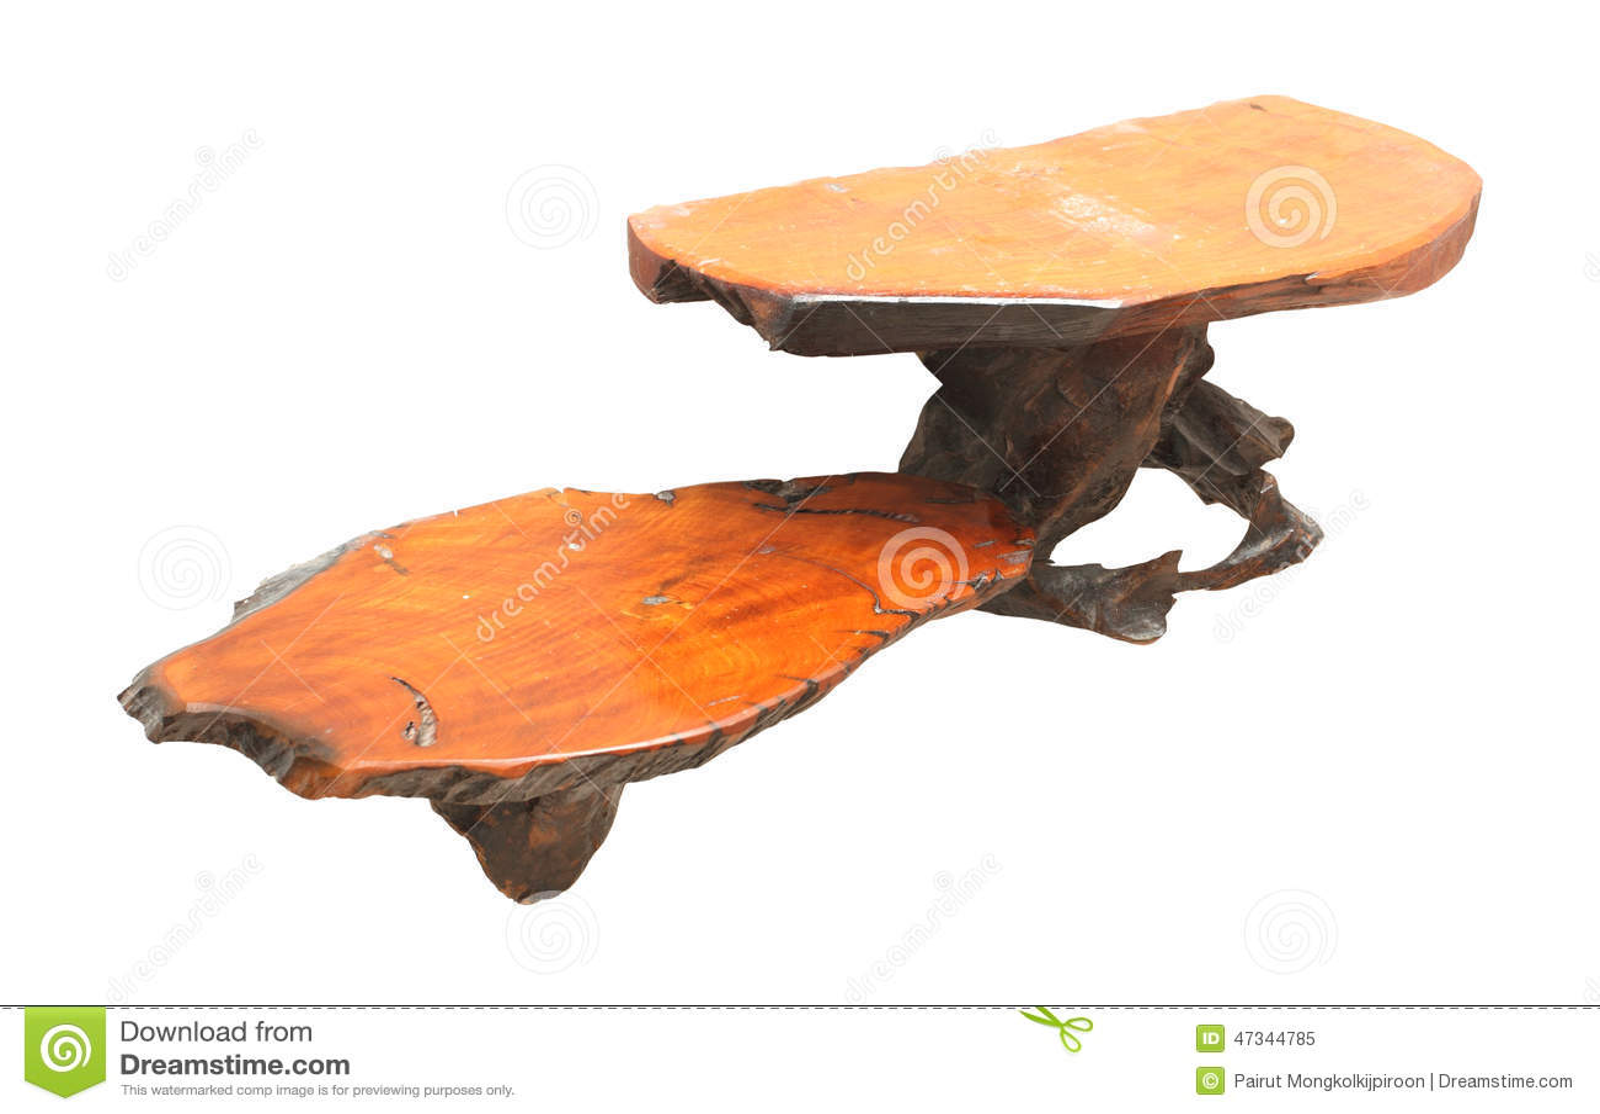 Wall Shelves Design Natural Wood Stock Photo - Image: 47344785